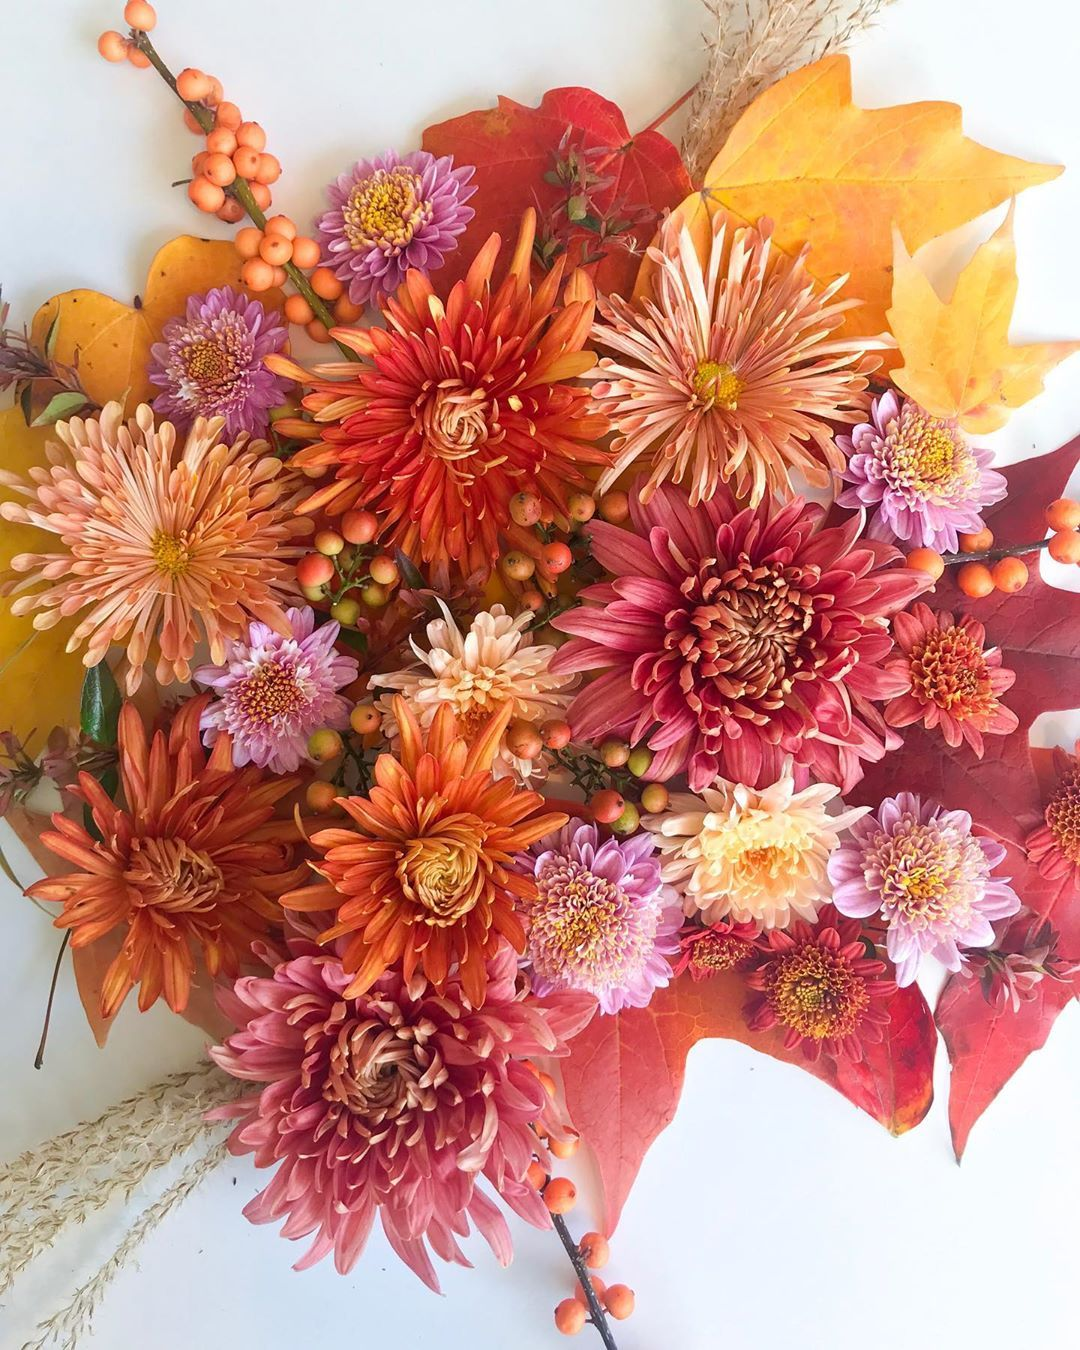 Little Acre Flowers On Instagram November Heirloommums Chrysanthemum Autumnflowers Autumncolors Autumnbouquet Fallin Fall Flowers Flowers Fall Bouquets